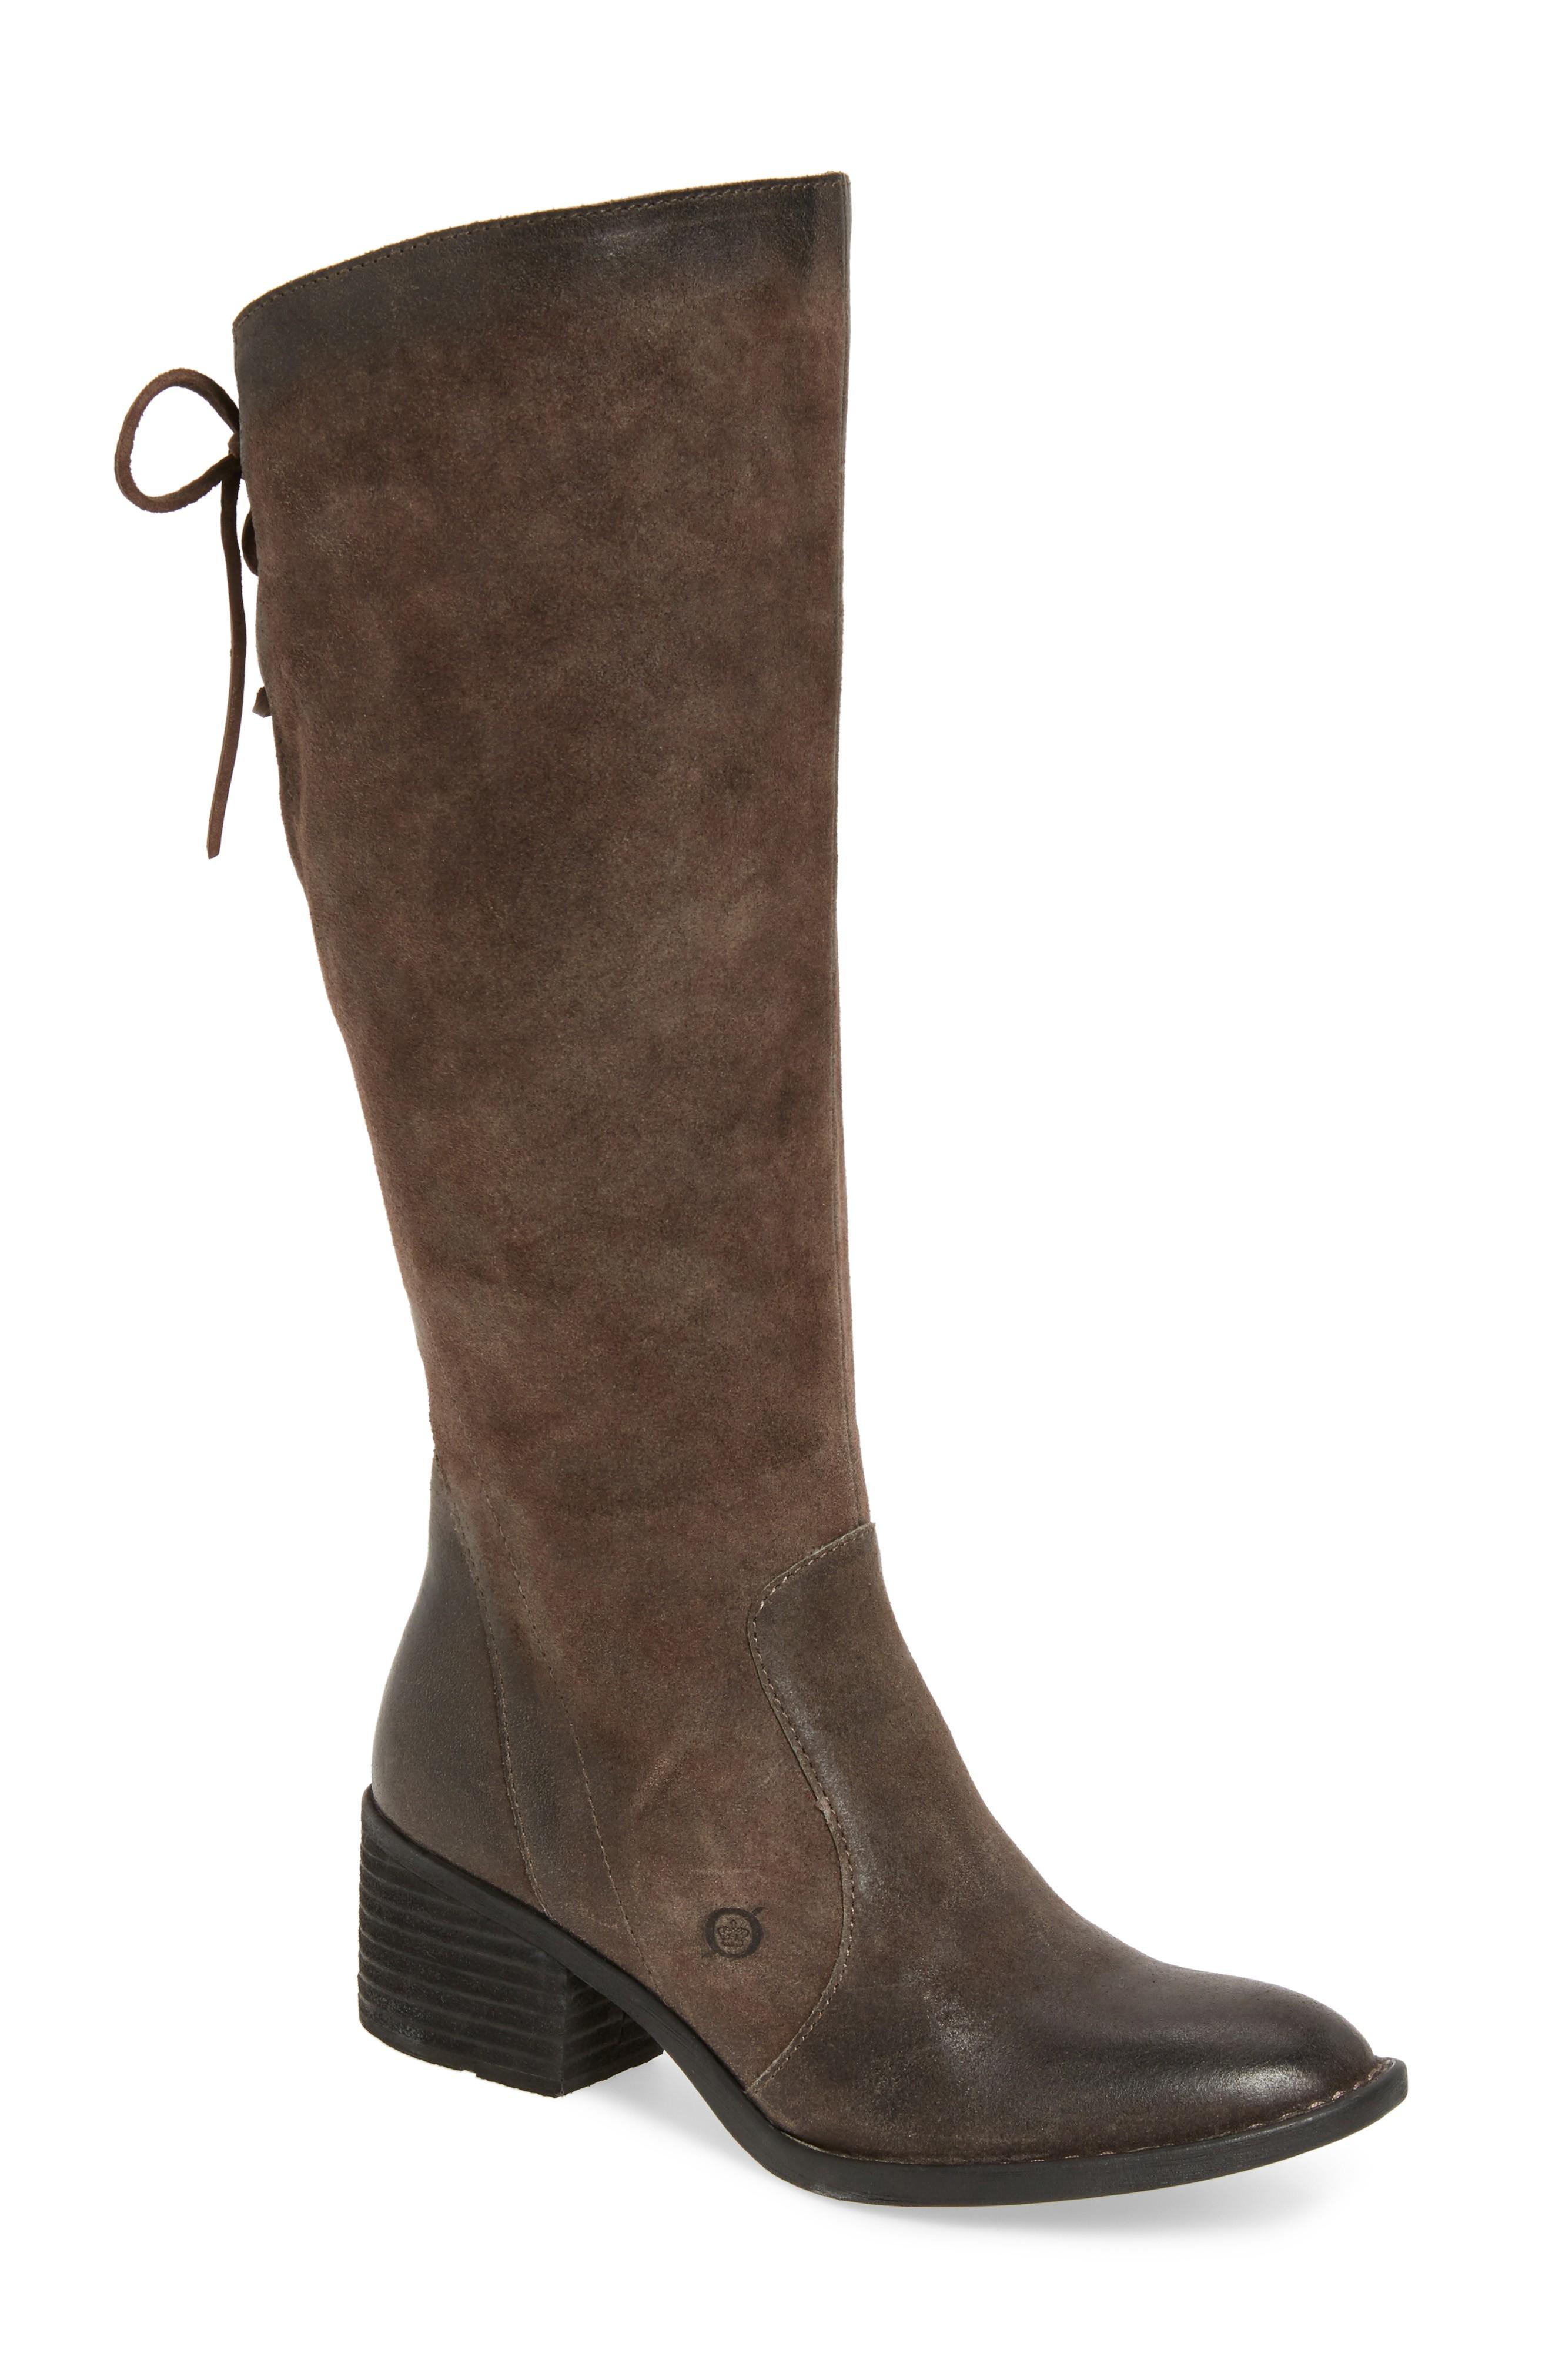 leather boots for women børn felicia knee high boot (women) (regular u0026 wide calf) nixqtfv